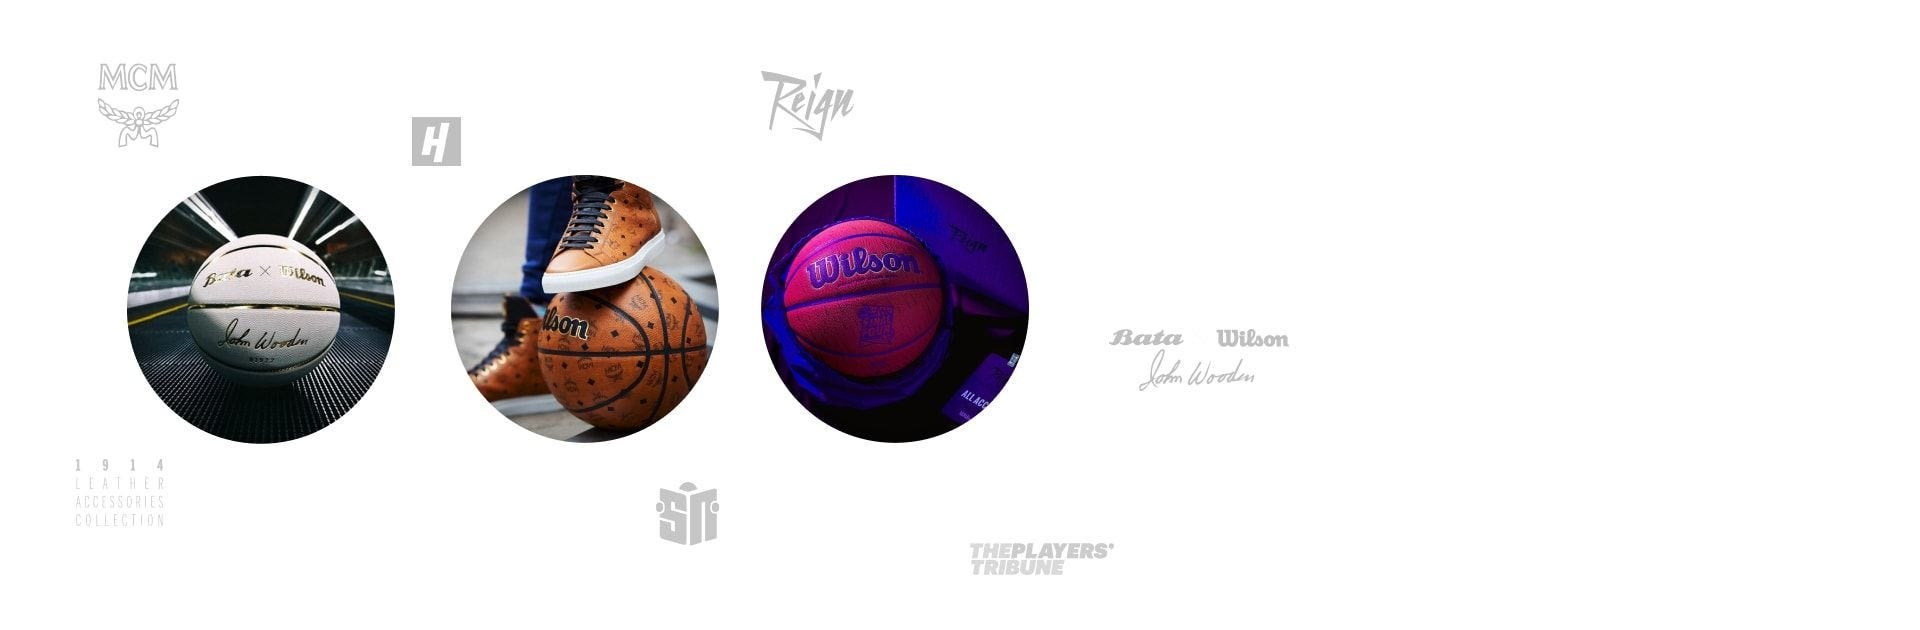 Limited Edition Basketballs